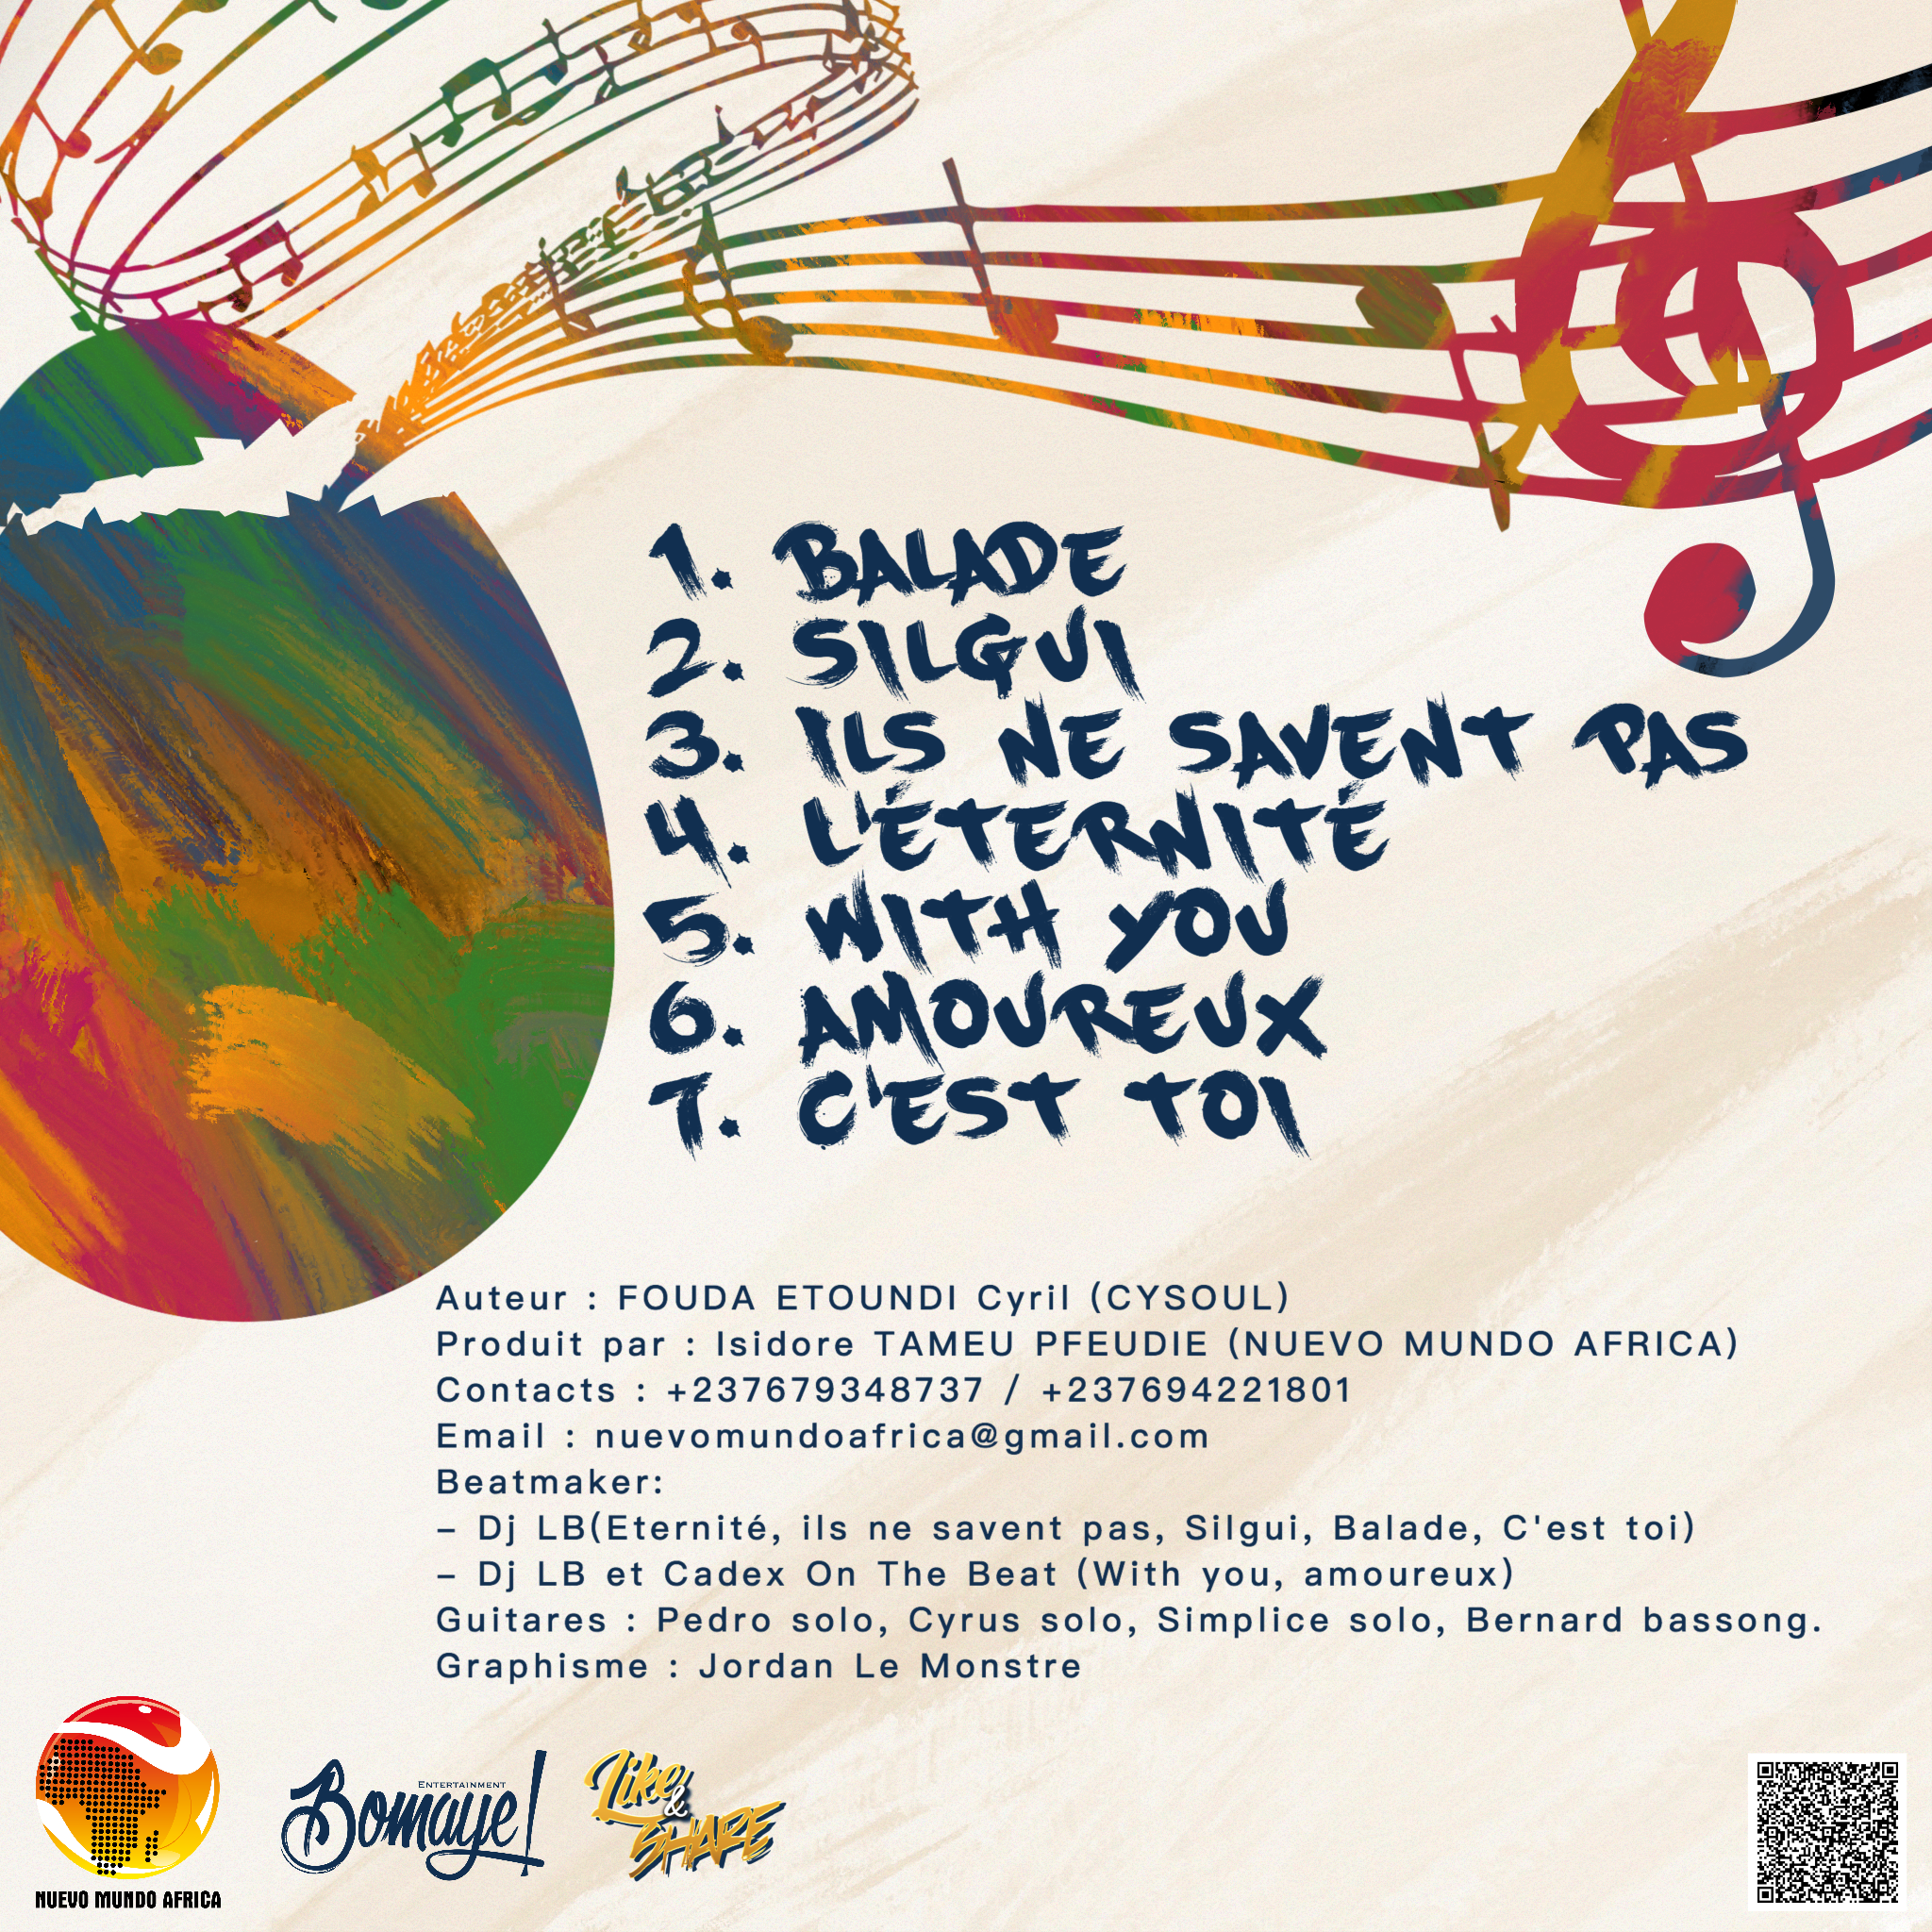 CYSOUL - ECLOSION (Album-Tracklist).PNG